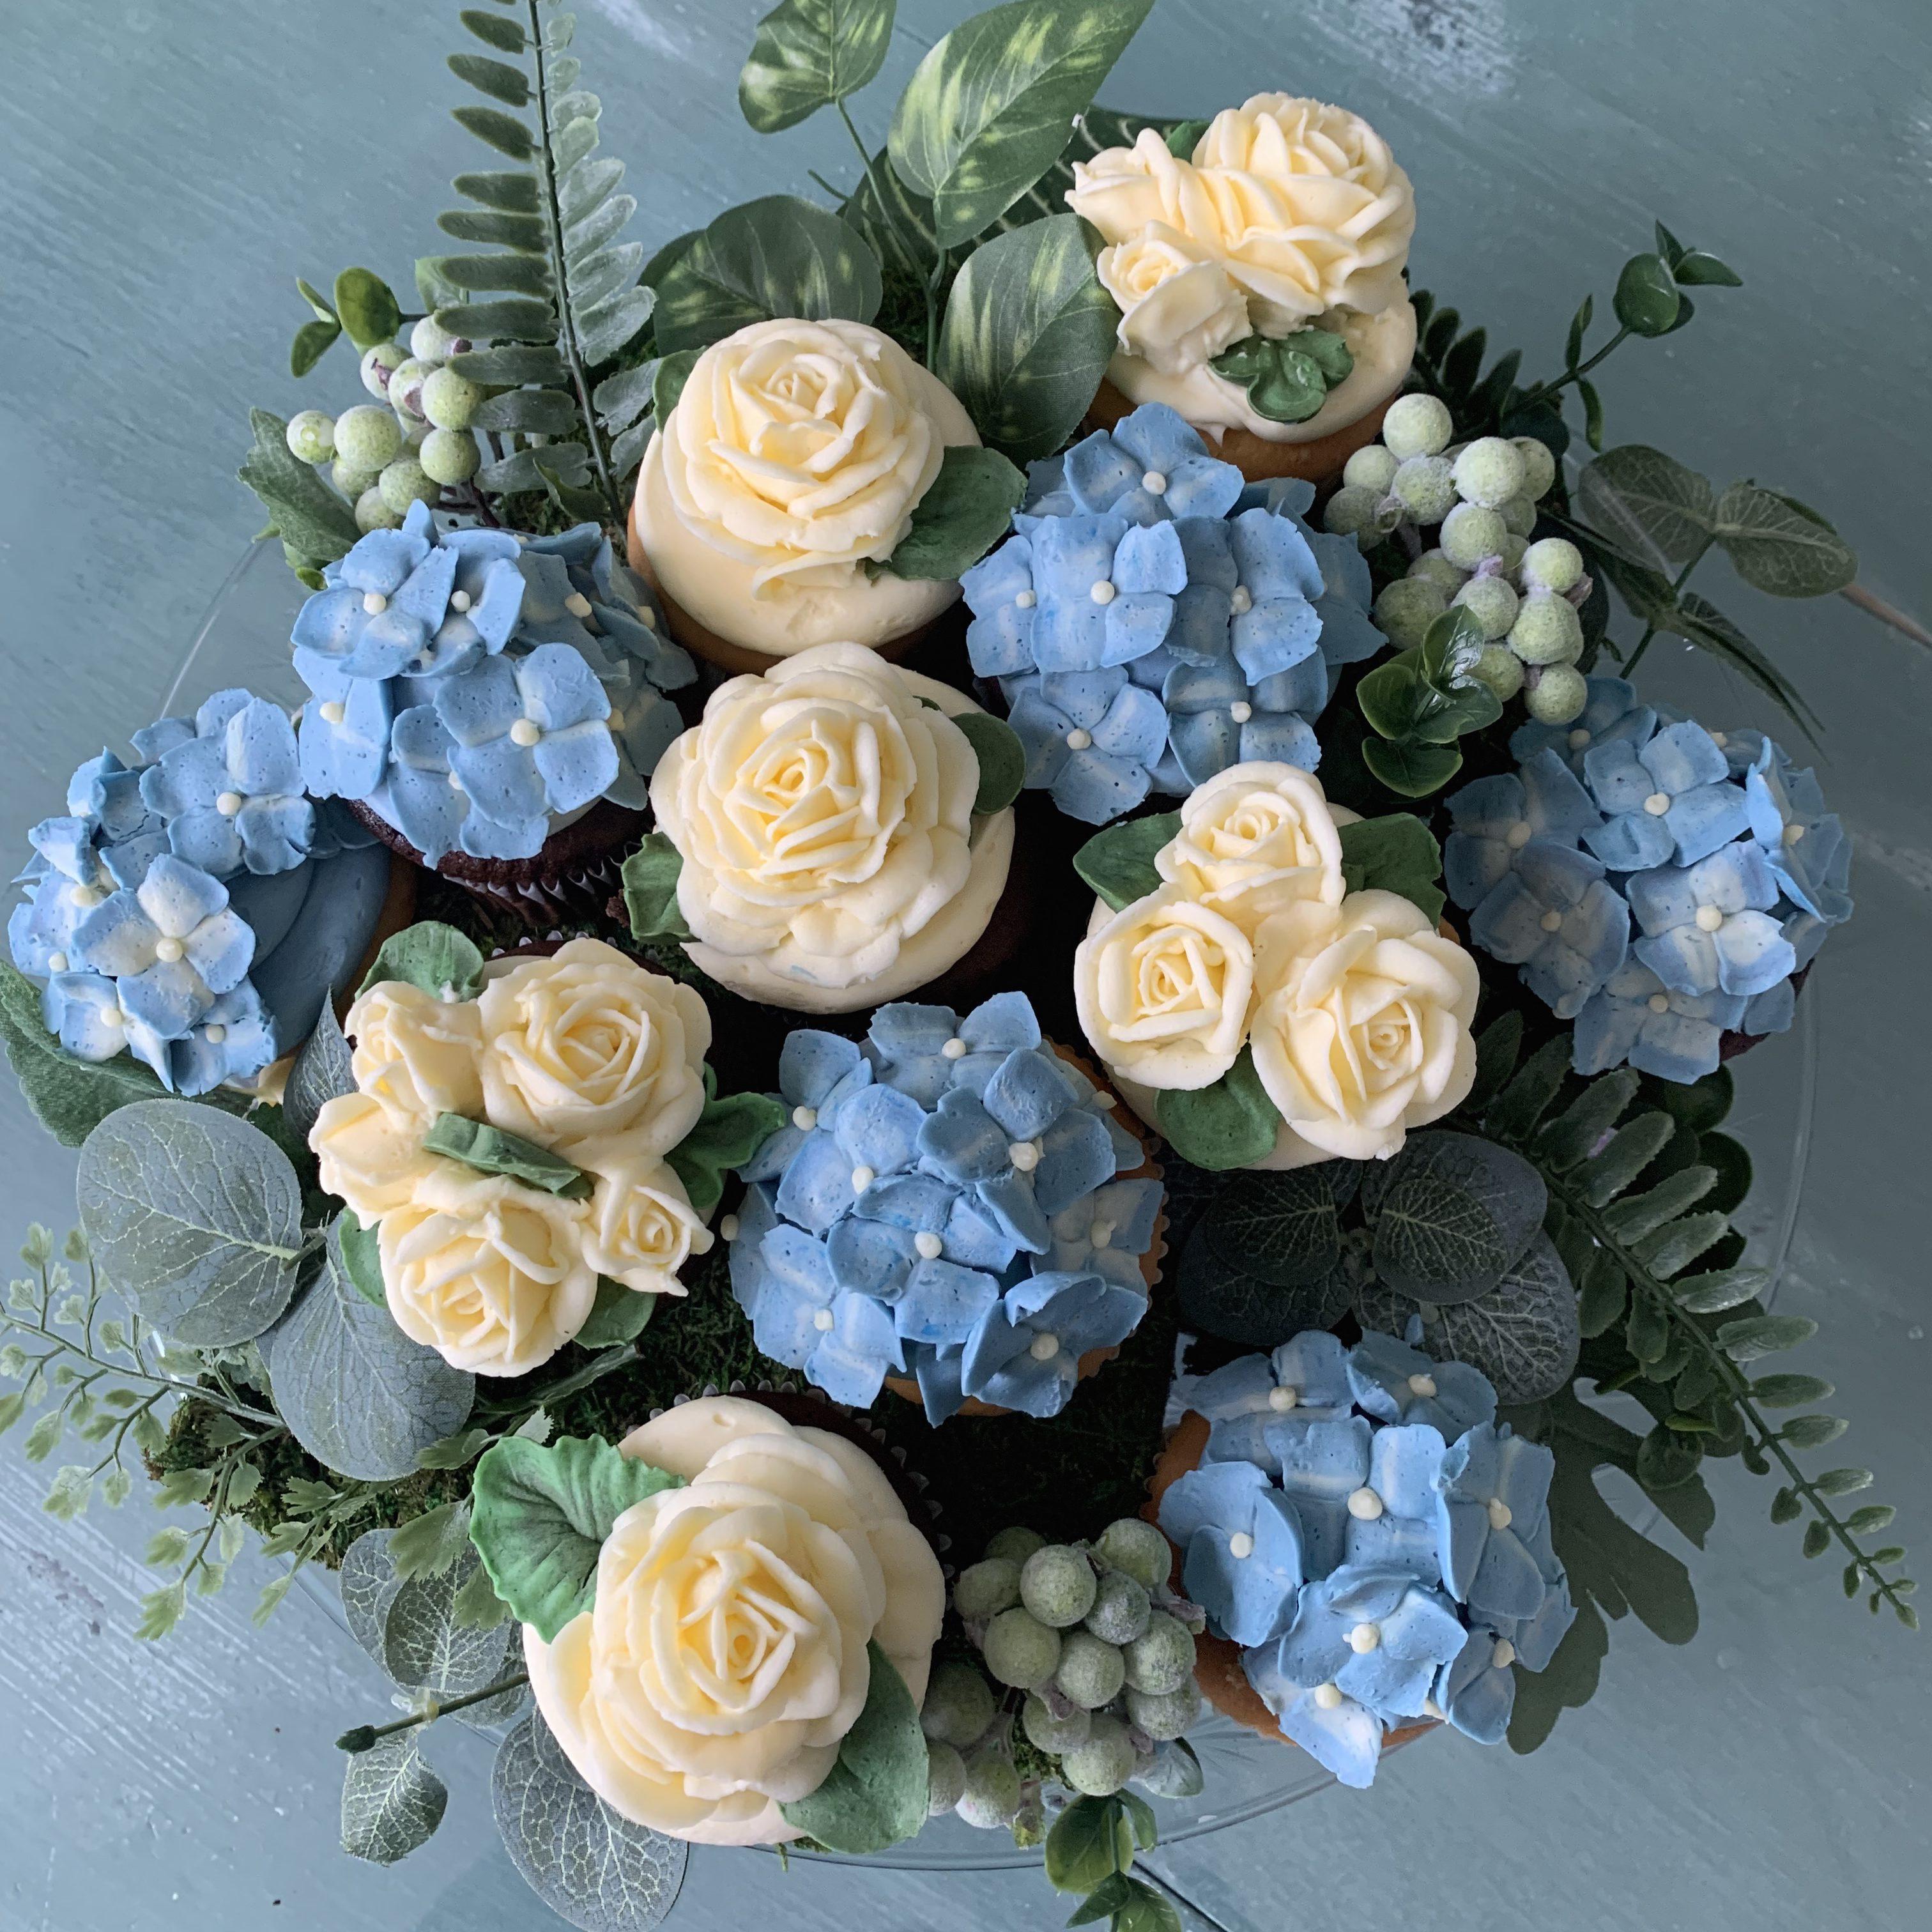 https://delicatelydelicious.com/wp-content/uploads/2019/05/White-Roses-and-Hydrangeas-e1558371032488.jpg